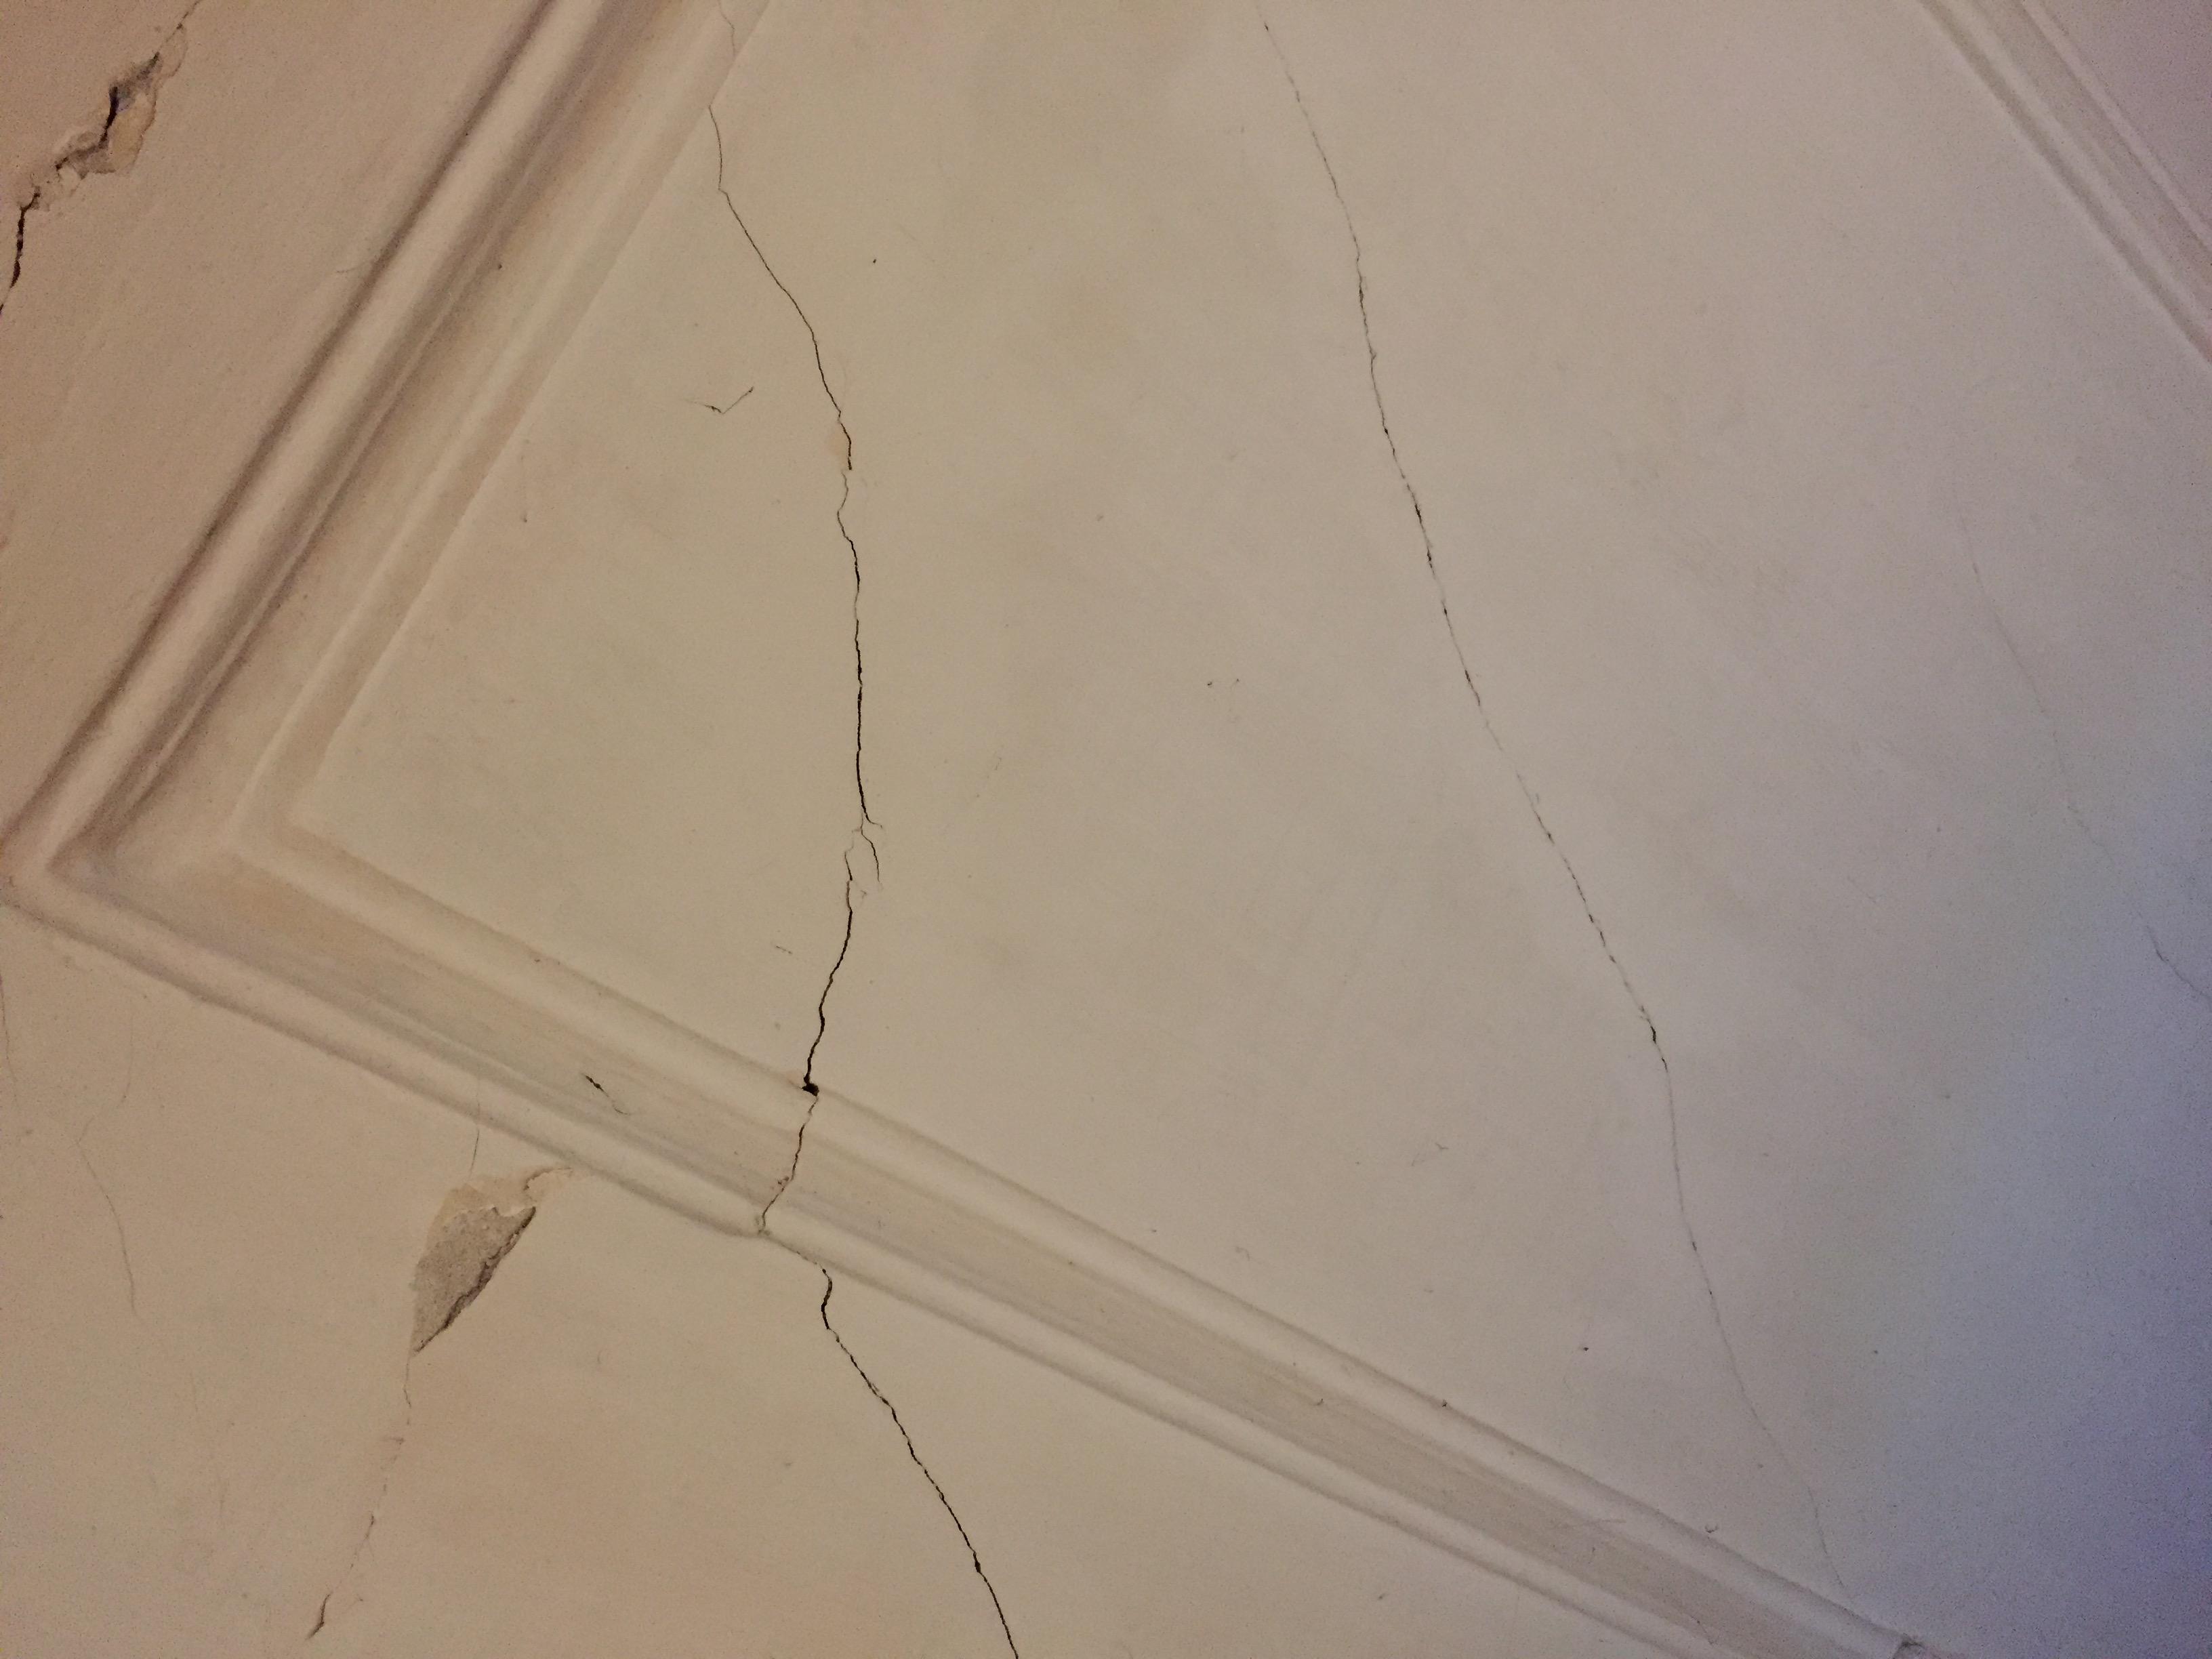 Plafond Zeil. Stunning Plafond Riet With Plafond Zeil. Perfect ...